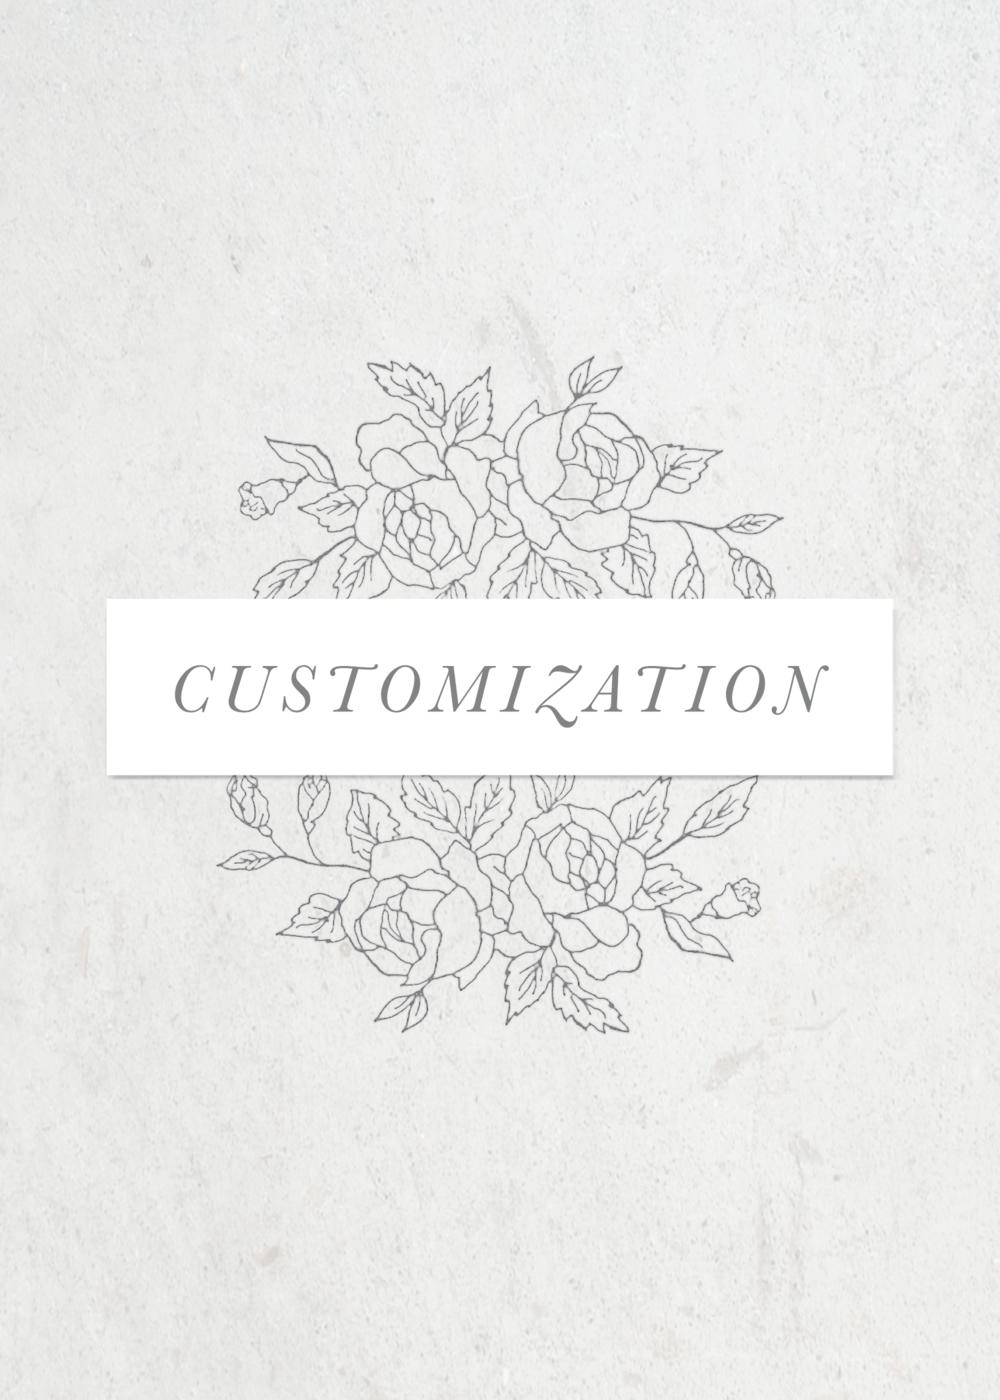 Customization-Image.png